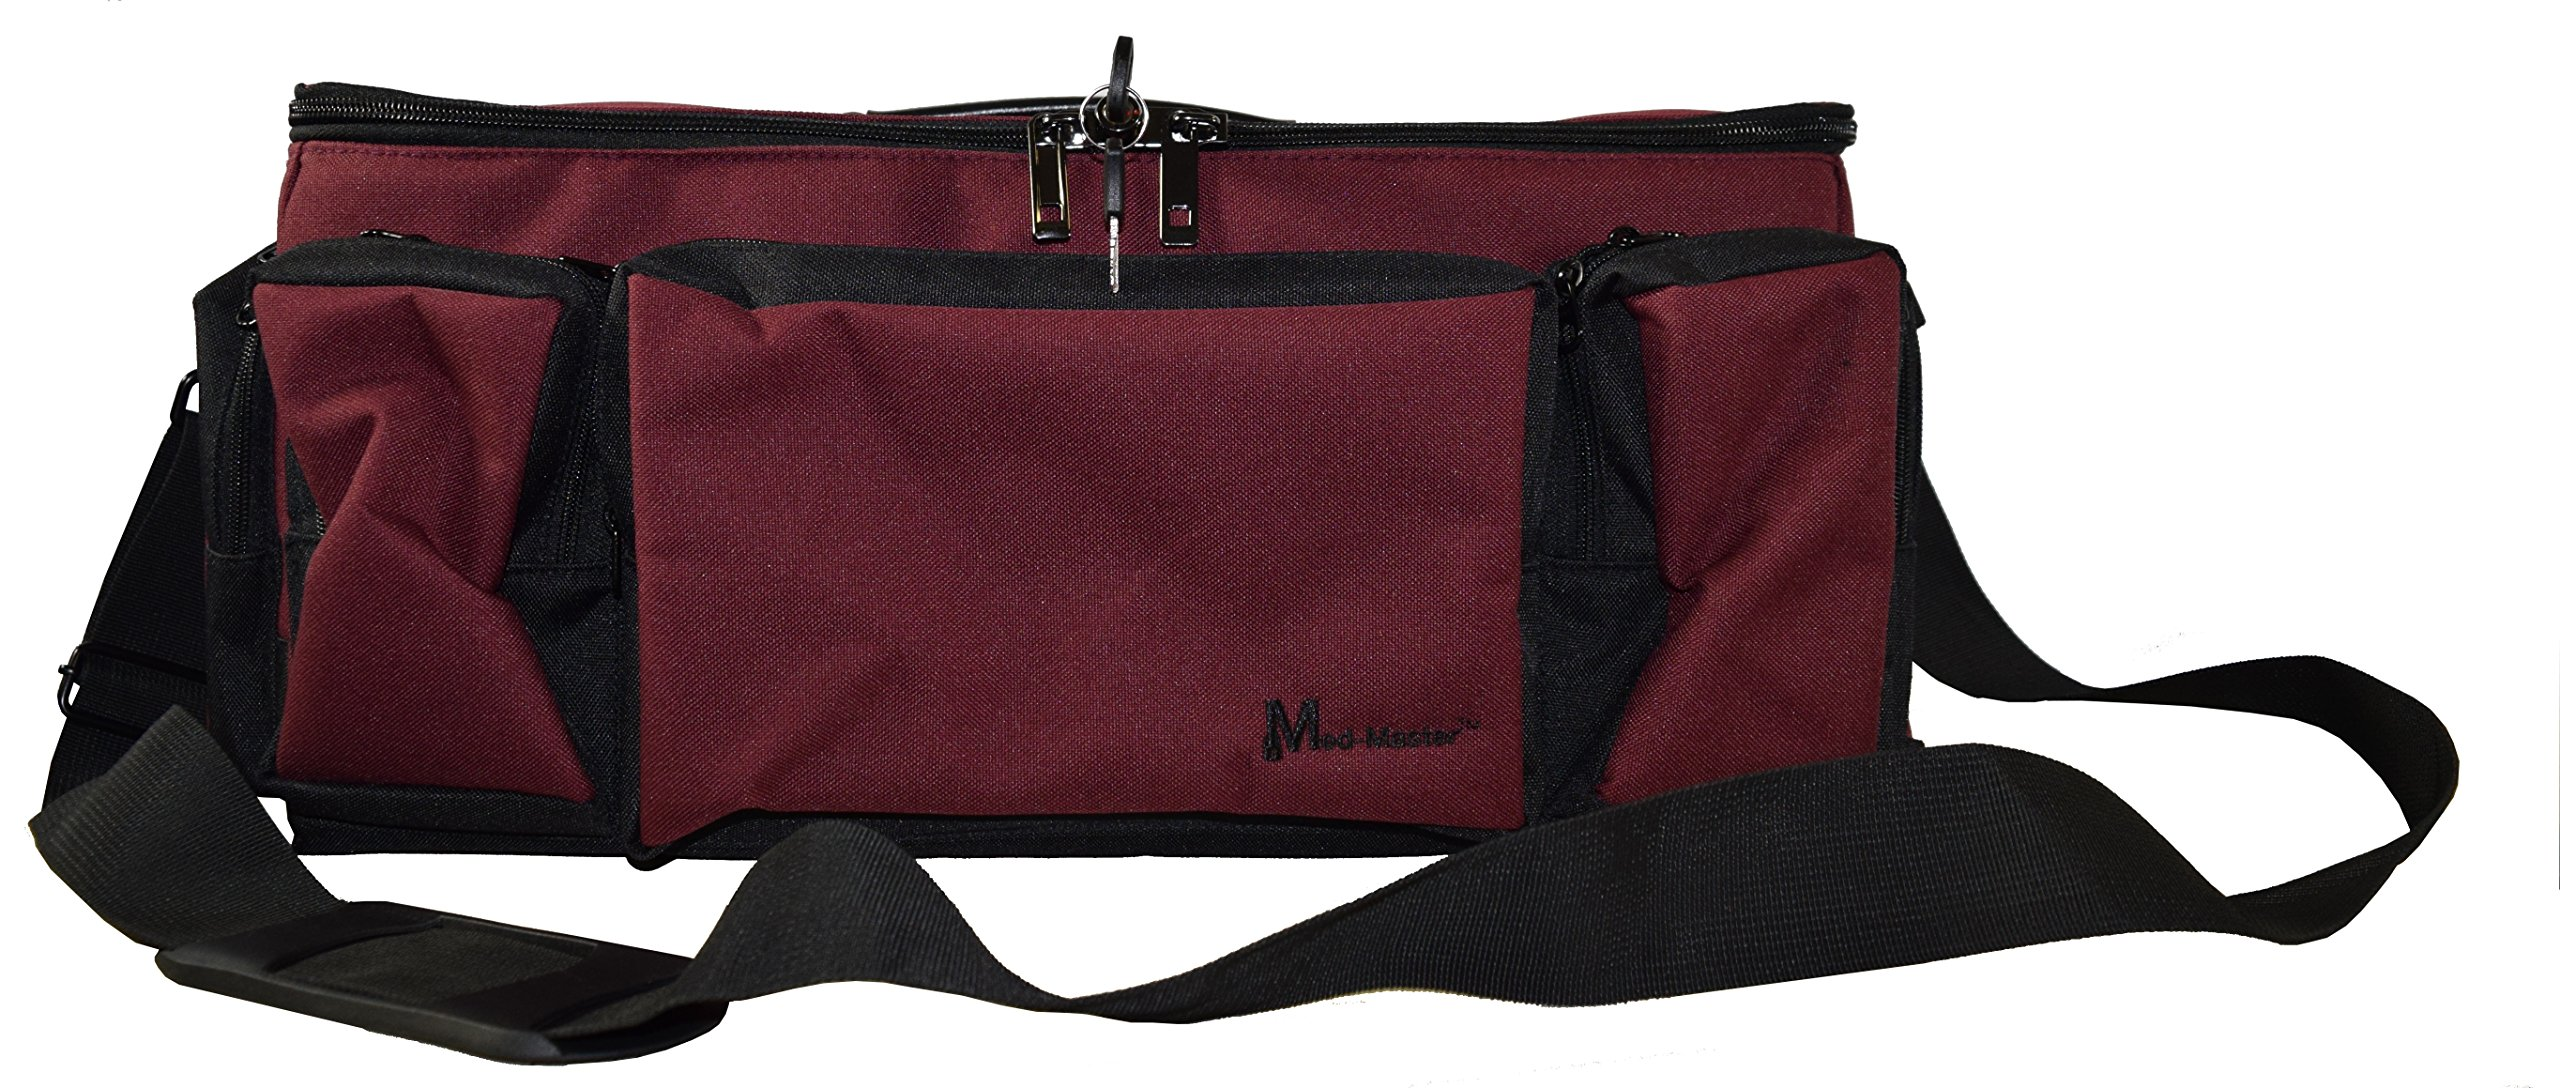 Med-Master Locking Medication Transport Bag, Burgundy (221800017) by STEELMASTER